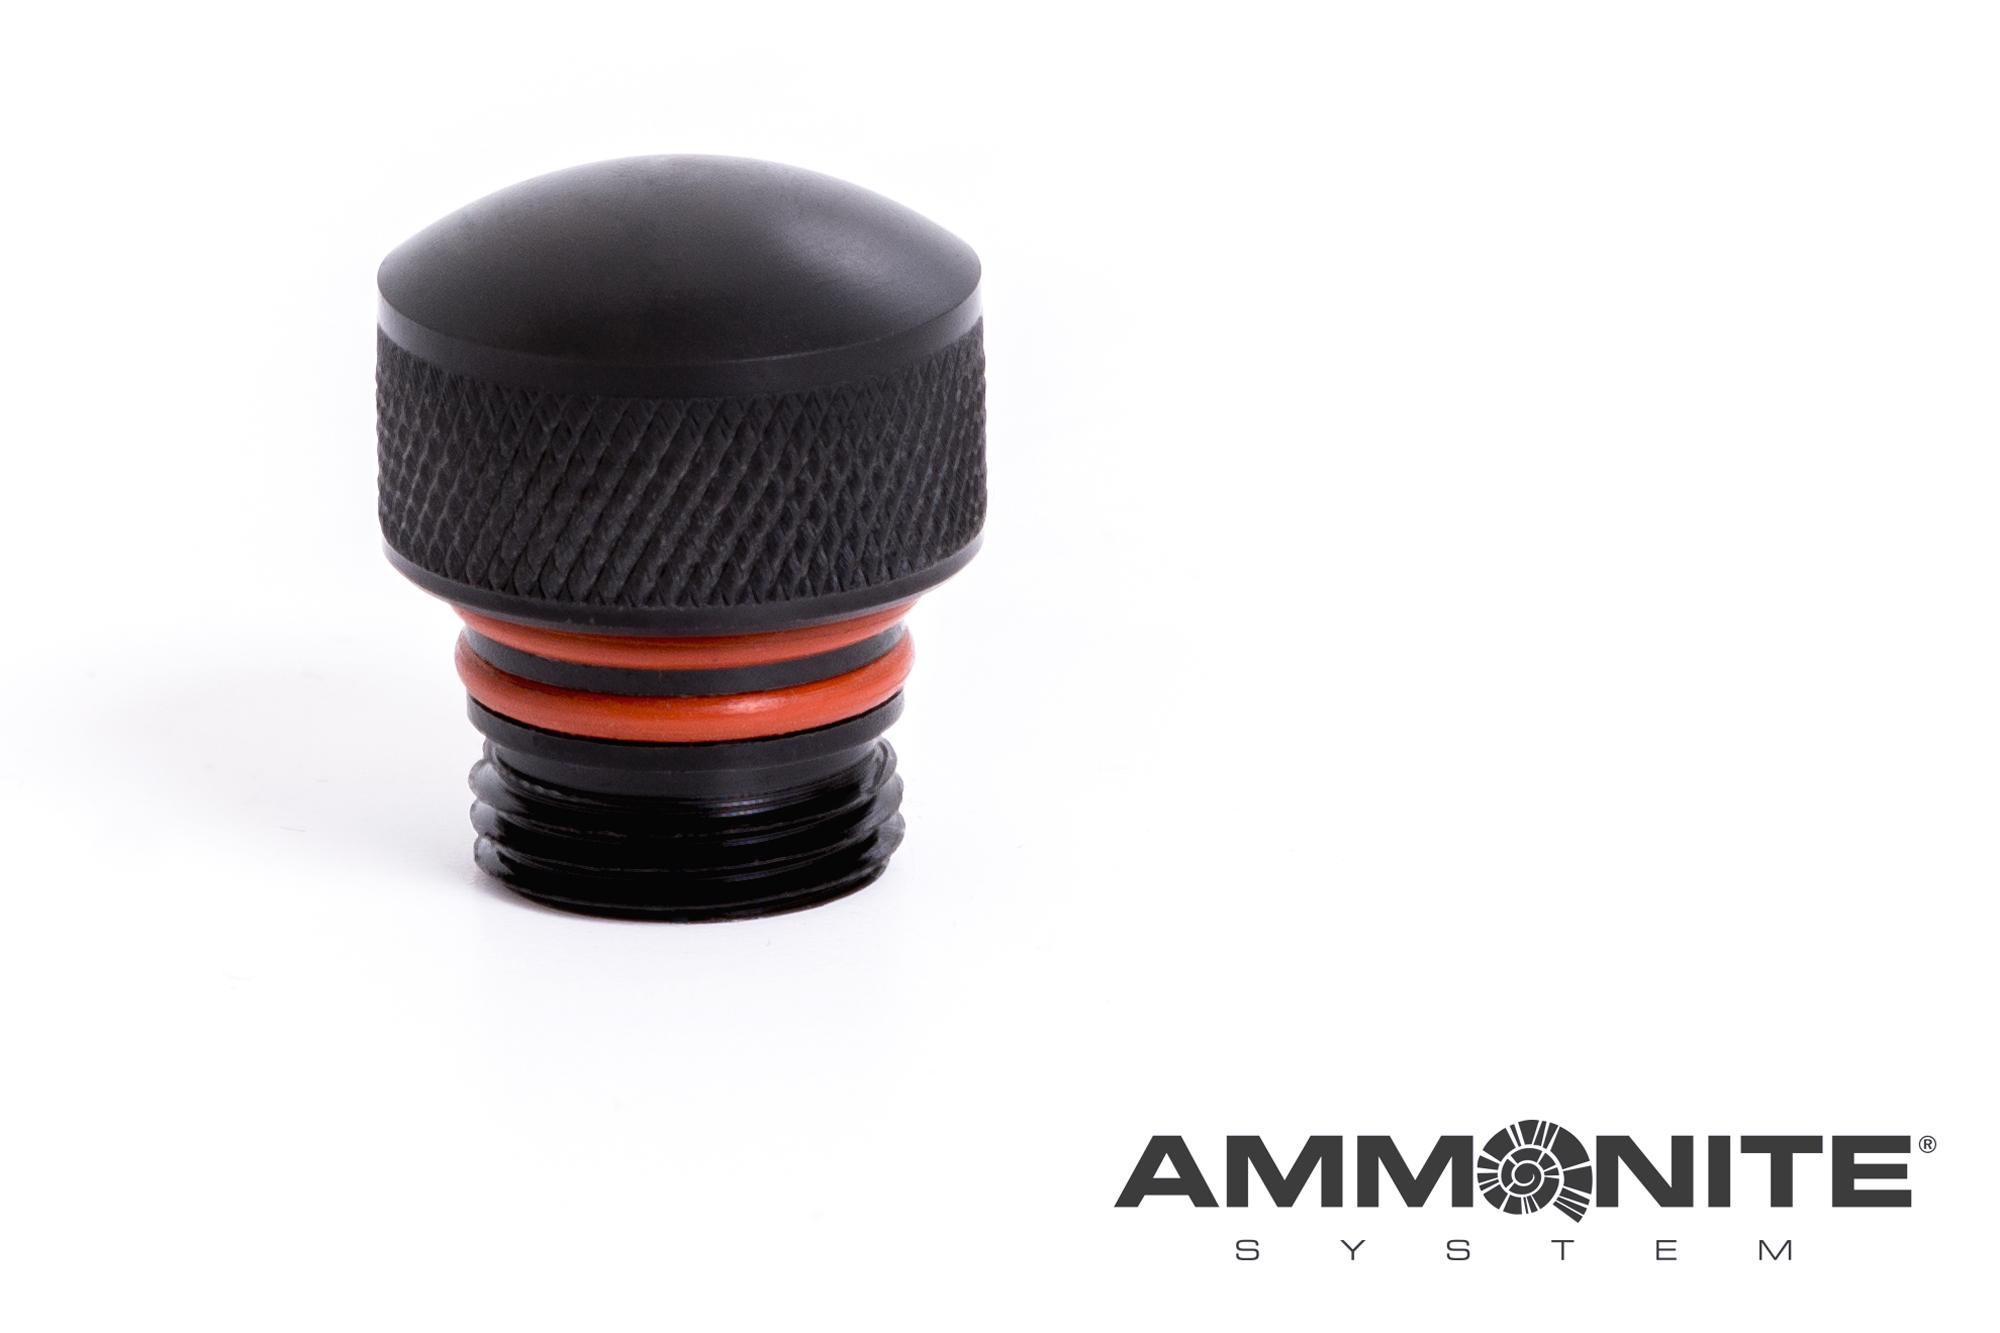 Ammonite Protection Plug